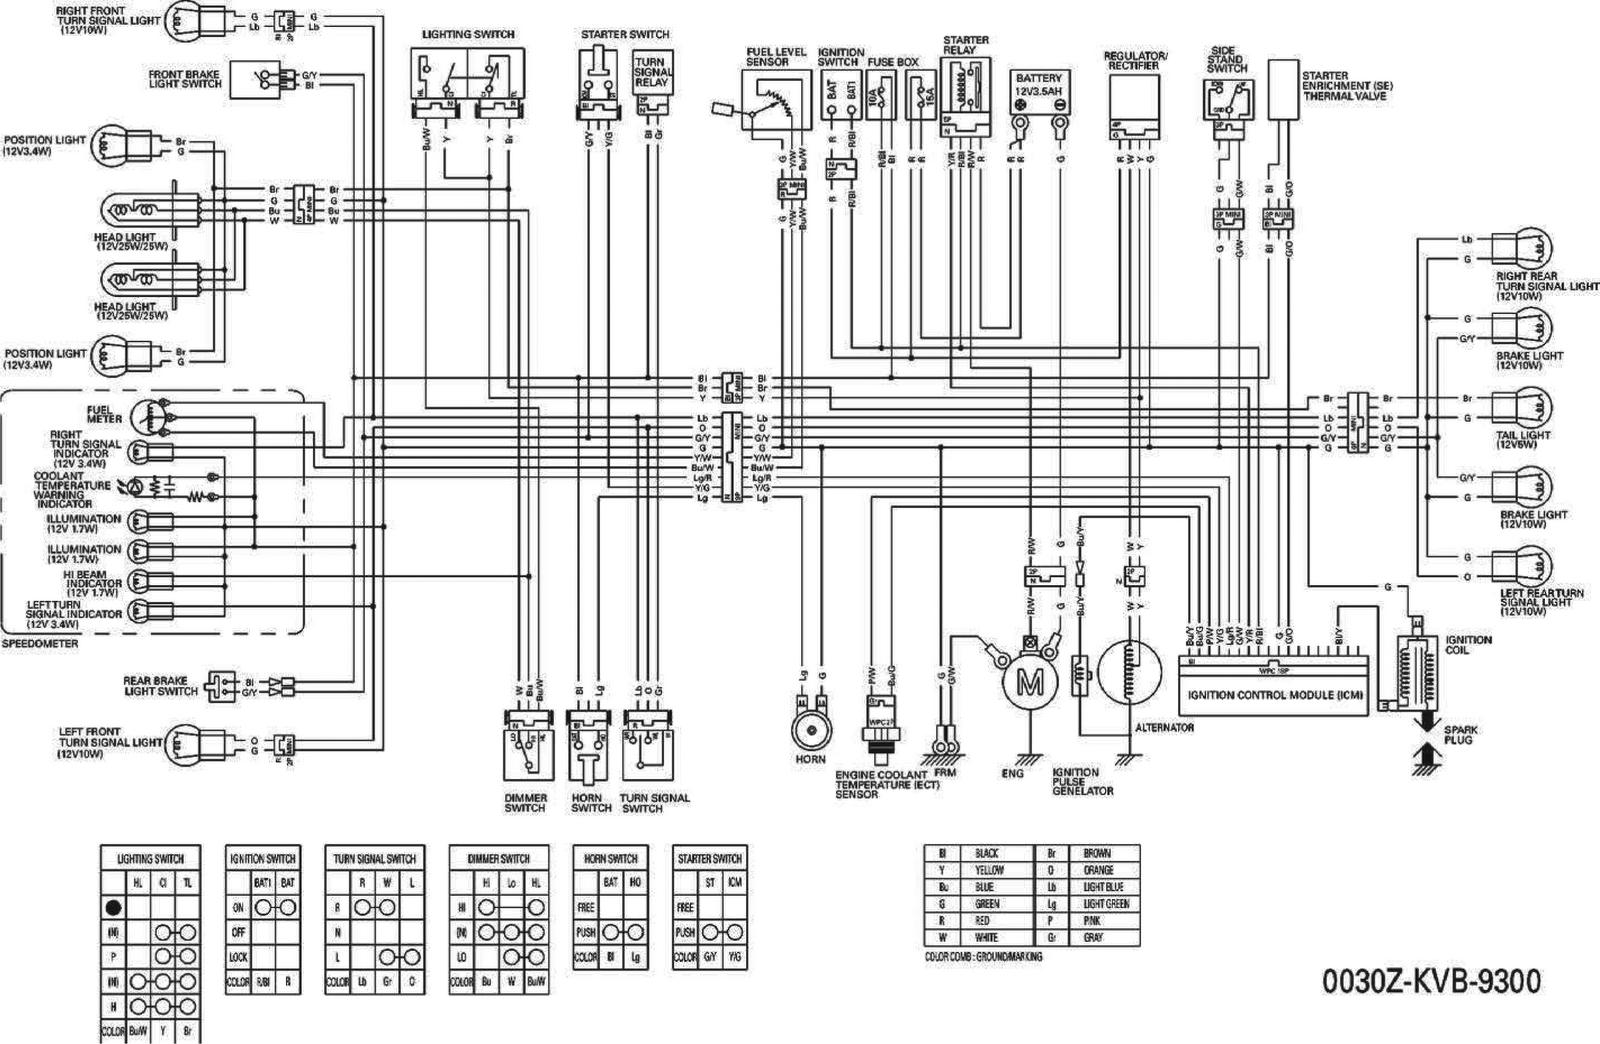 Enchanting Honda Qr 50 Wiring Diagram Ideas - Best Image Schematics ...